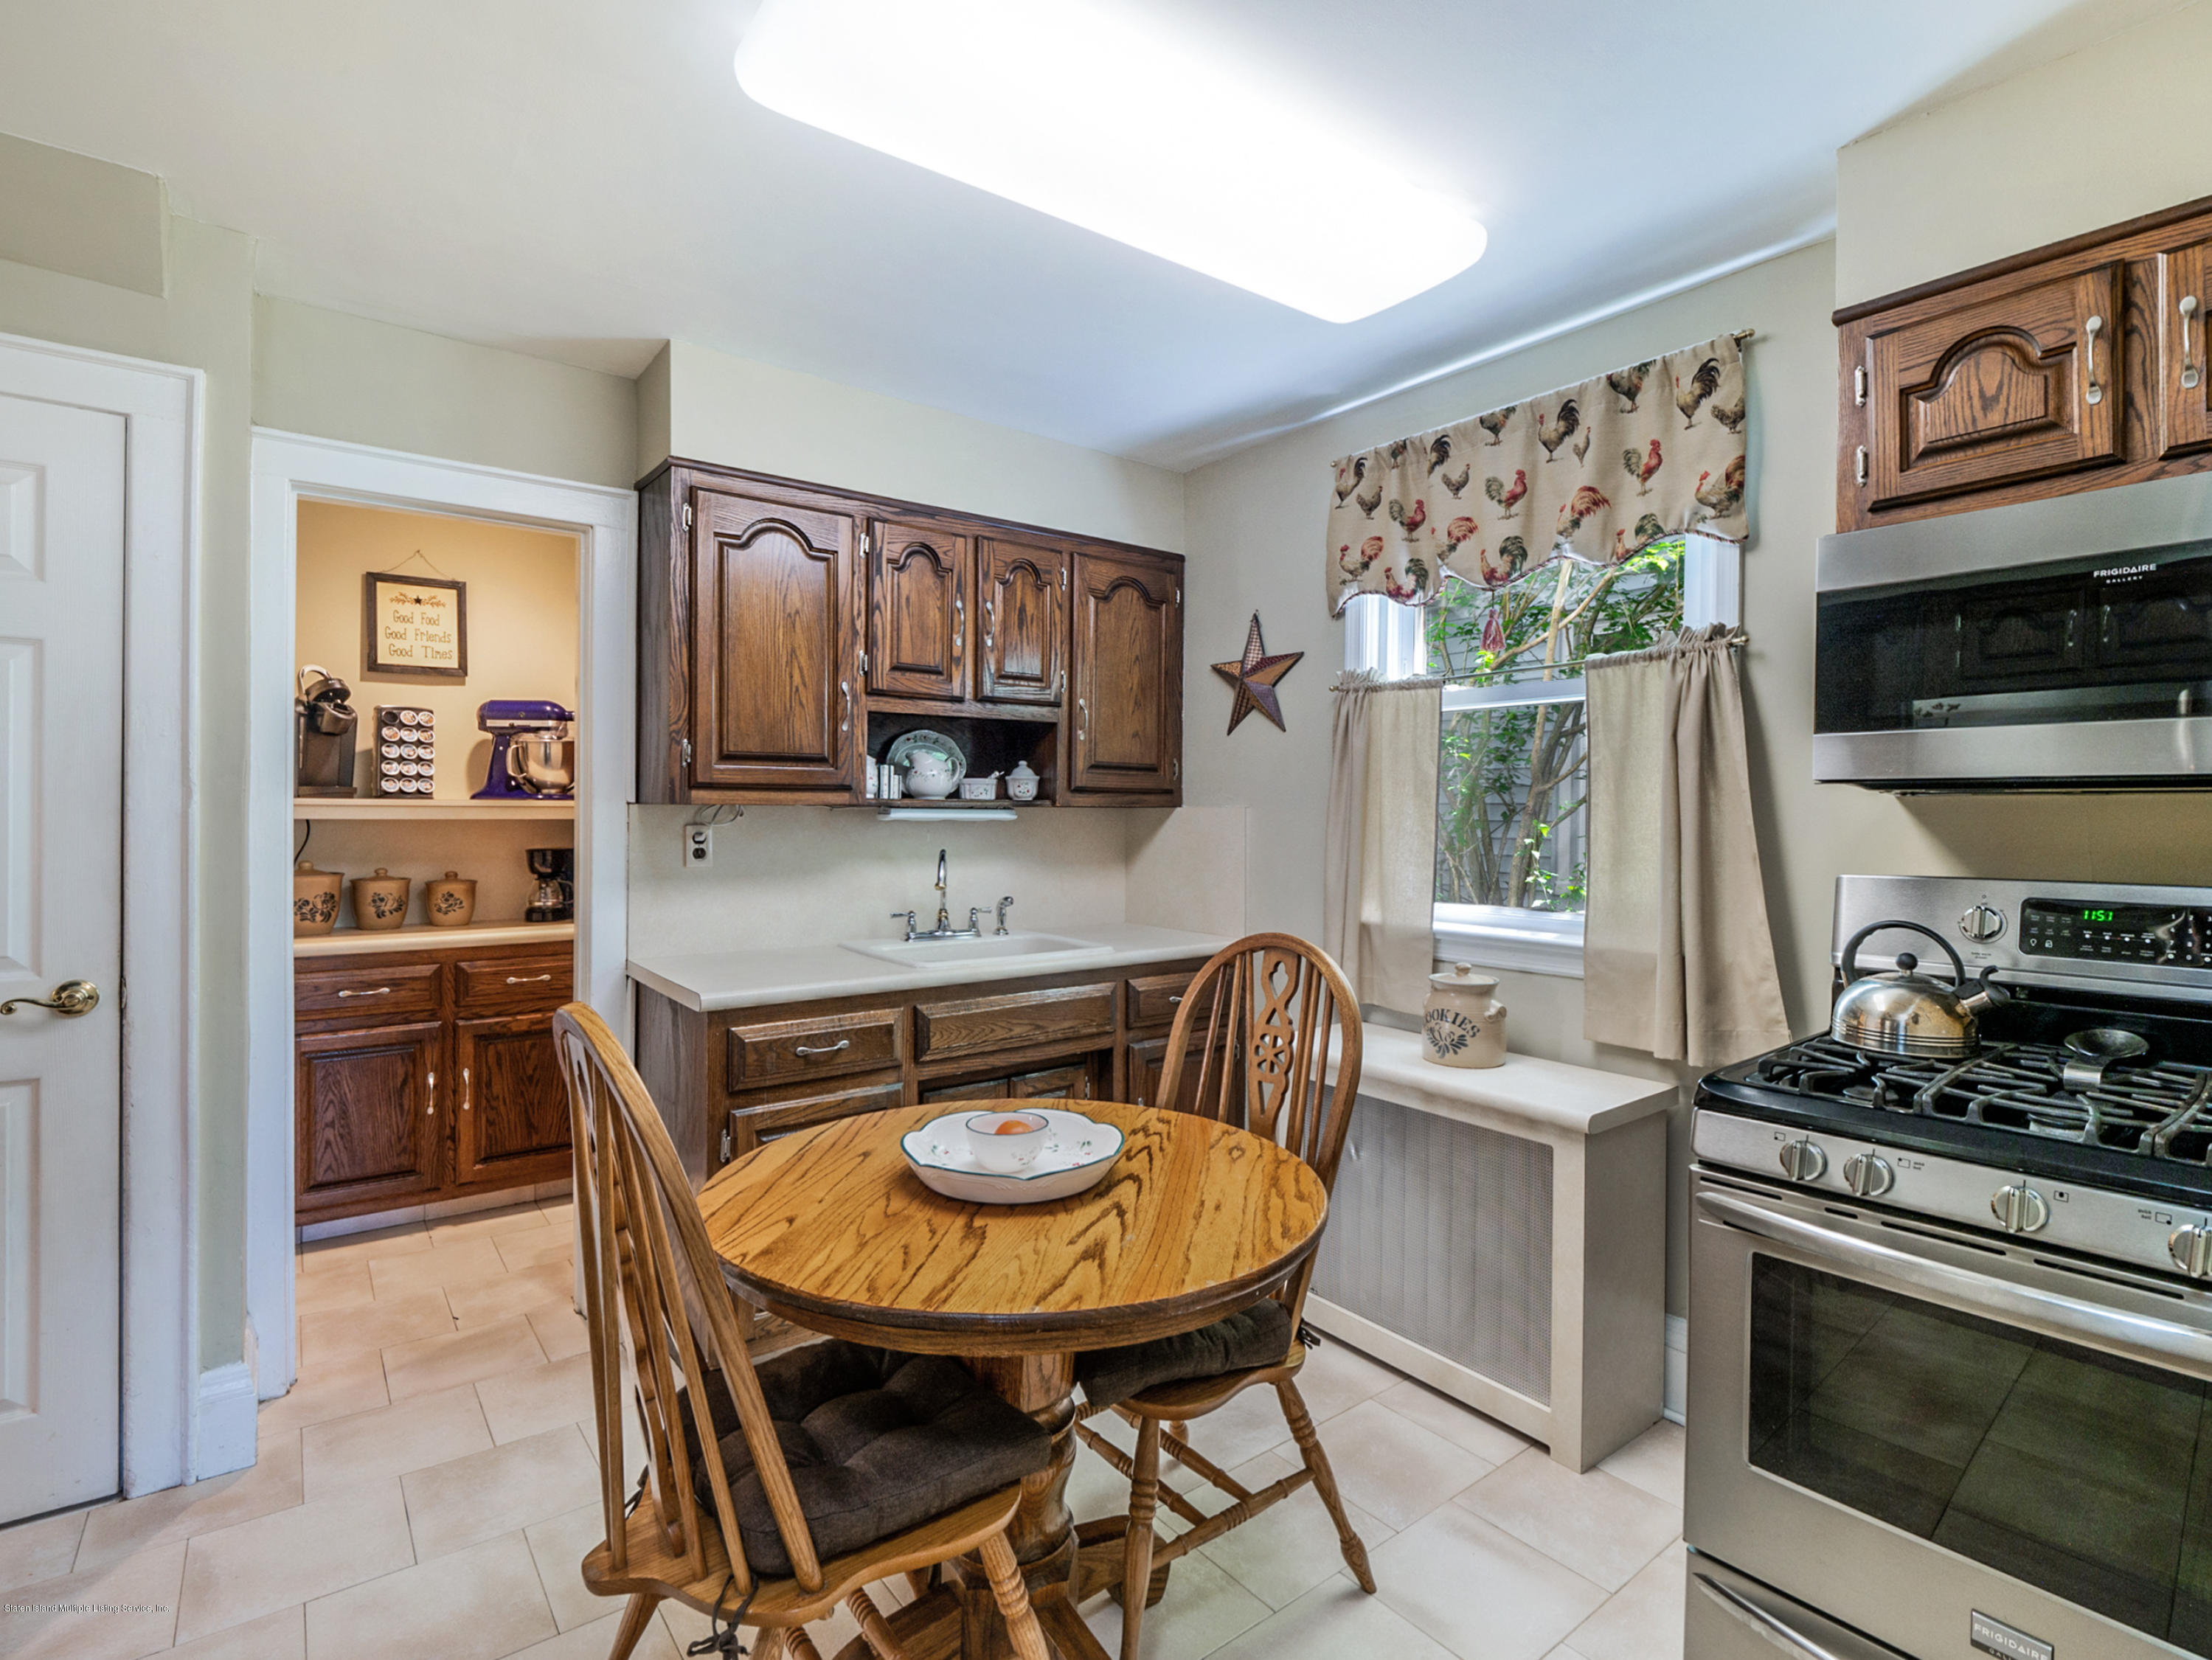 Single Family - Detached 229 Morrison Avenue  Staten Island, NY 10310, MLS-1139057-13